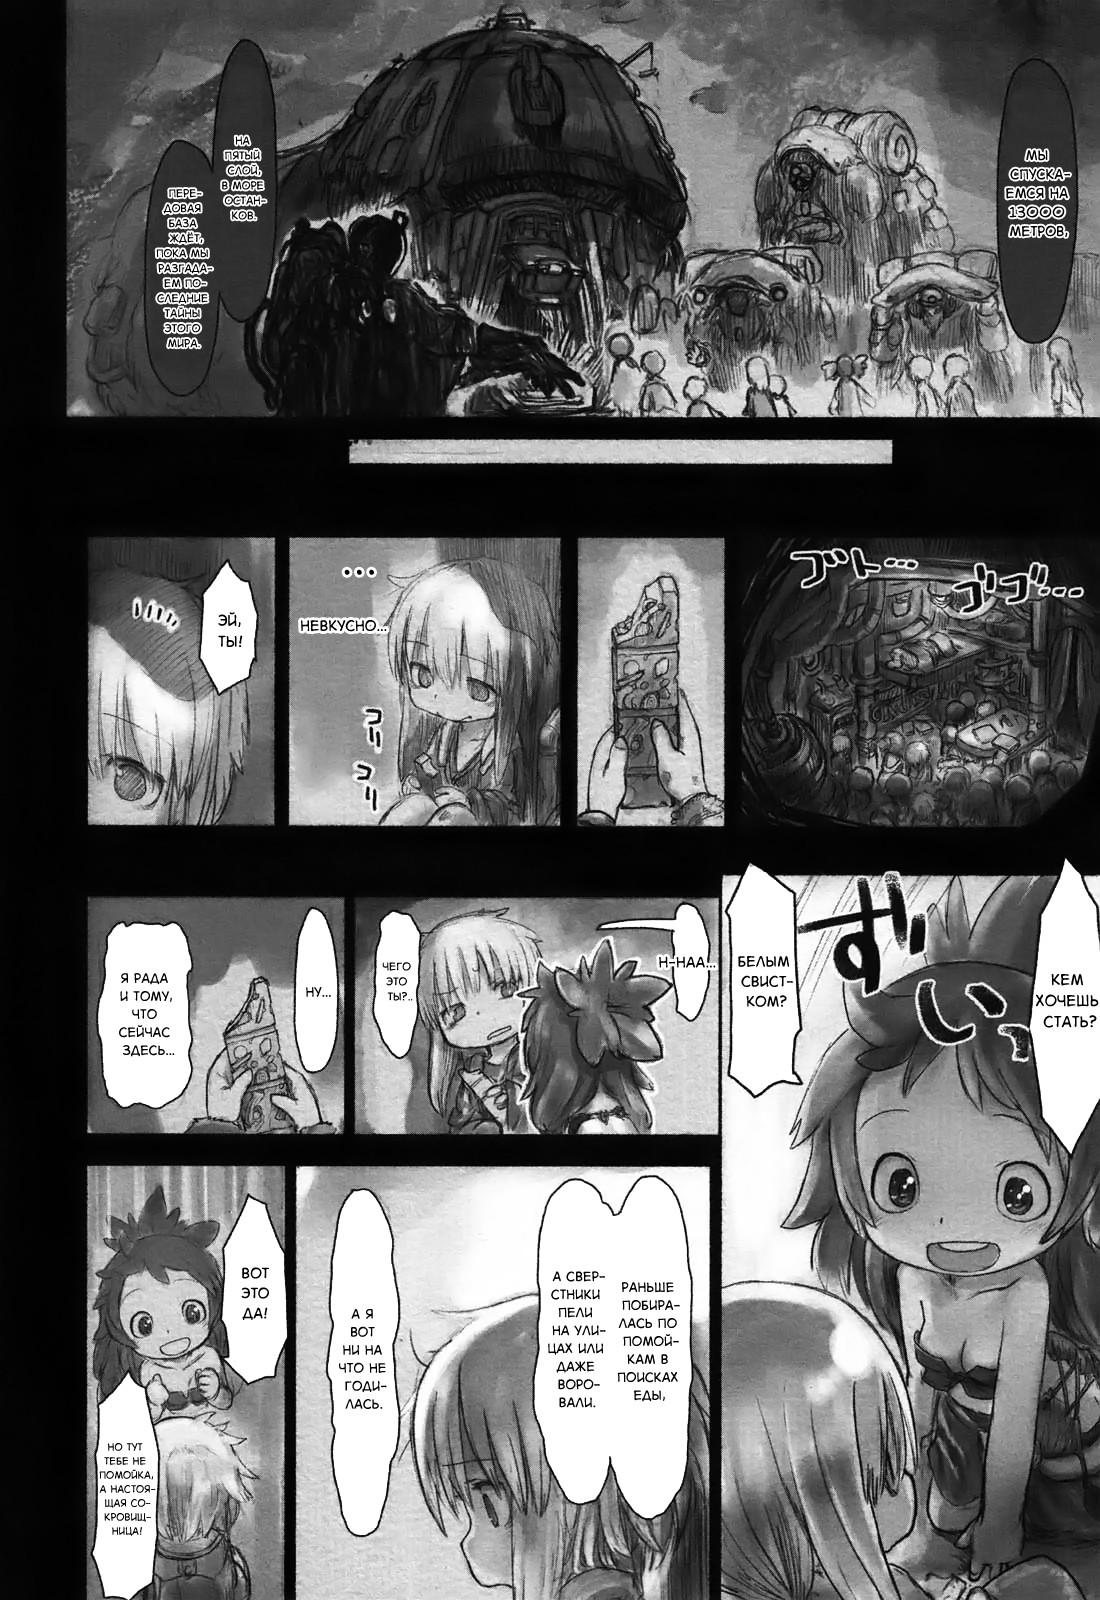 https://r1.ninemanga.com/comics/pic2/54/32566/389376/1513634754688.jpg Page 4